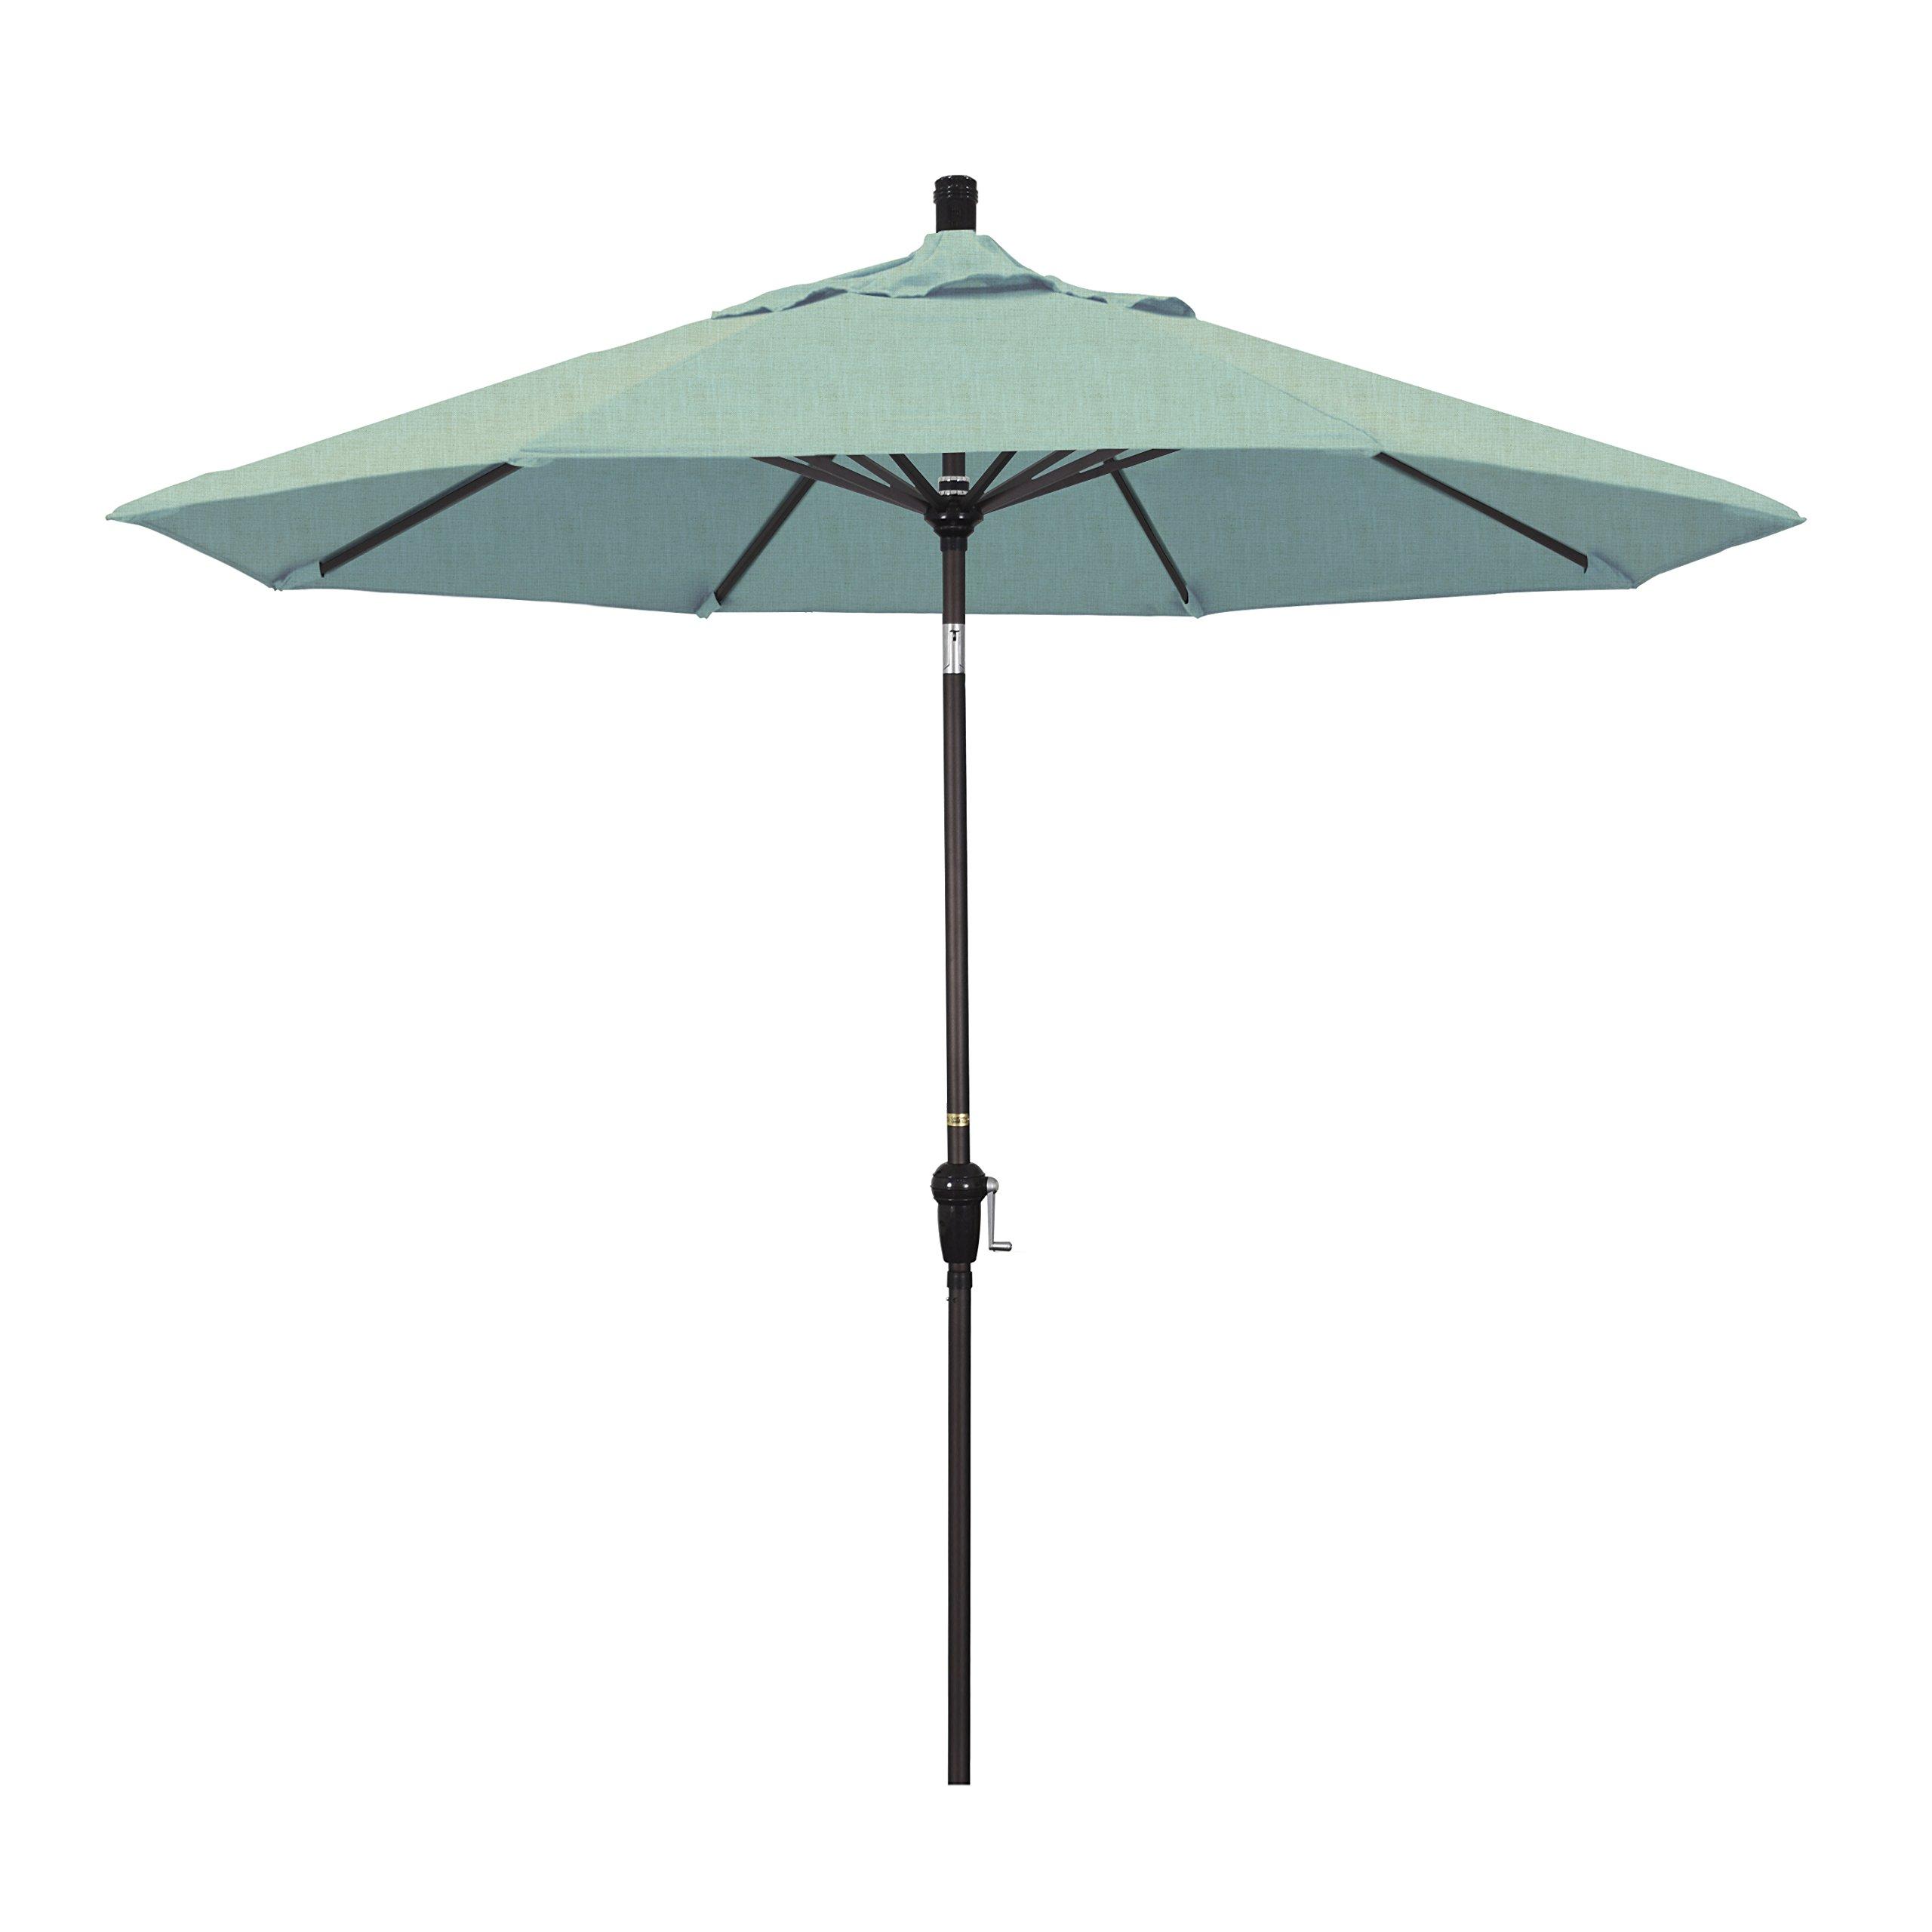 California Umbrella 9' Round Aluminum Market Umbrella, Crank Lift, Auto Tilt, Bronze Pole, Sunbrella Spa